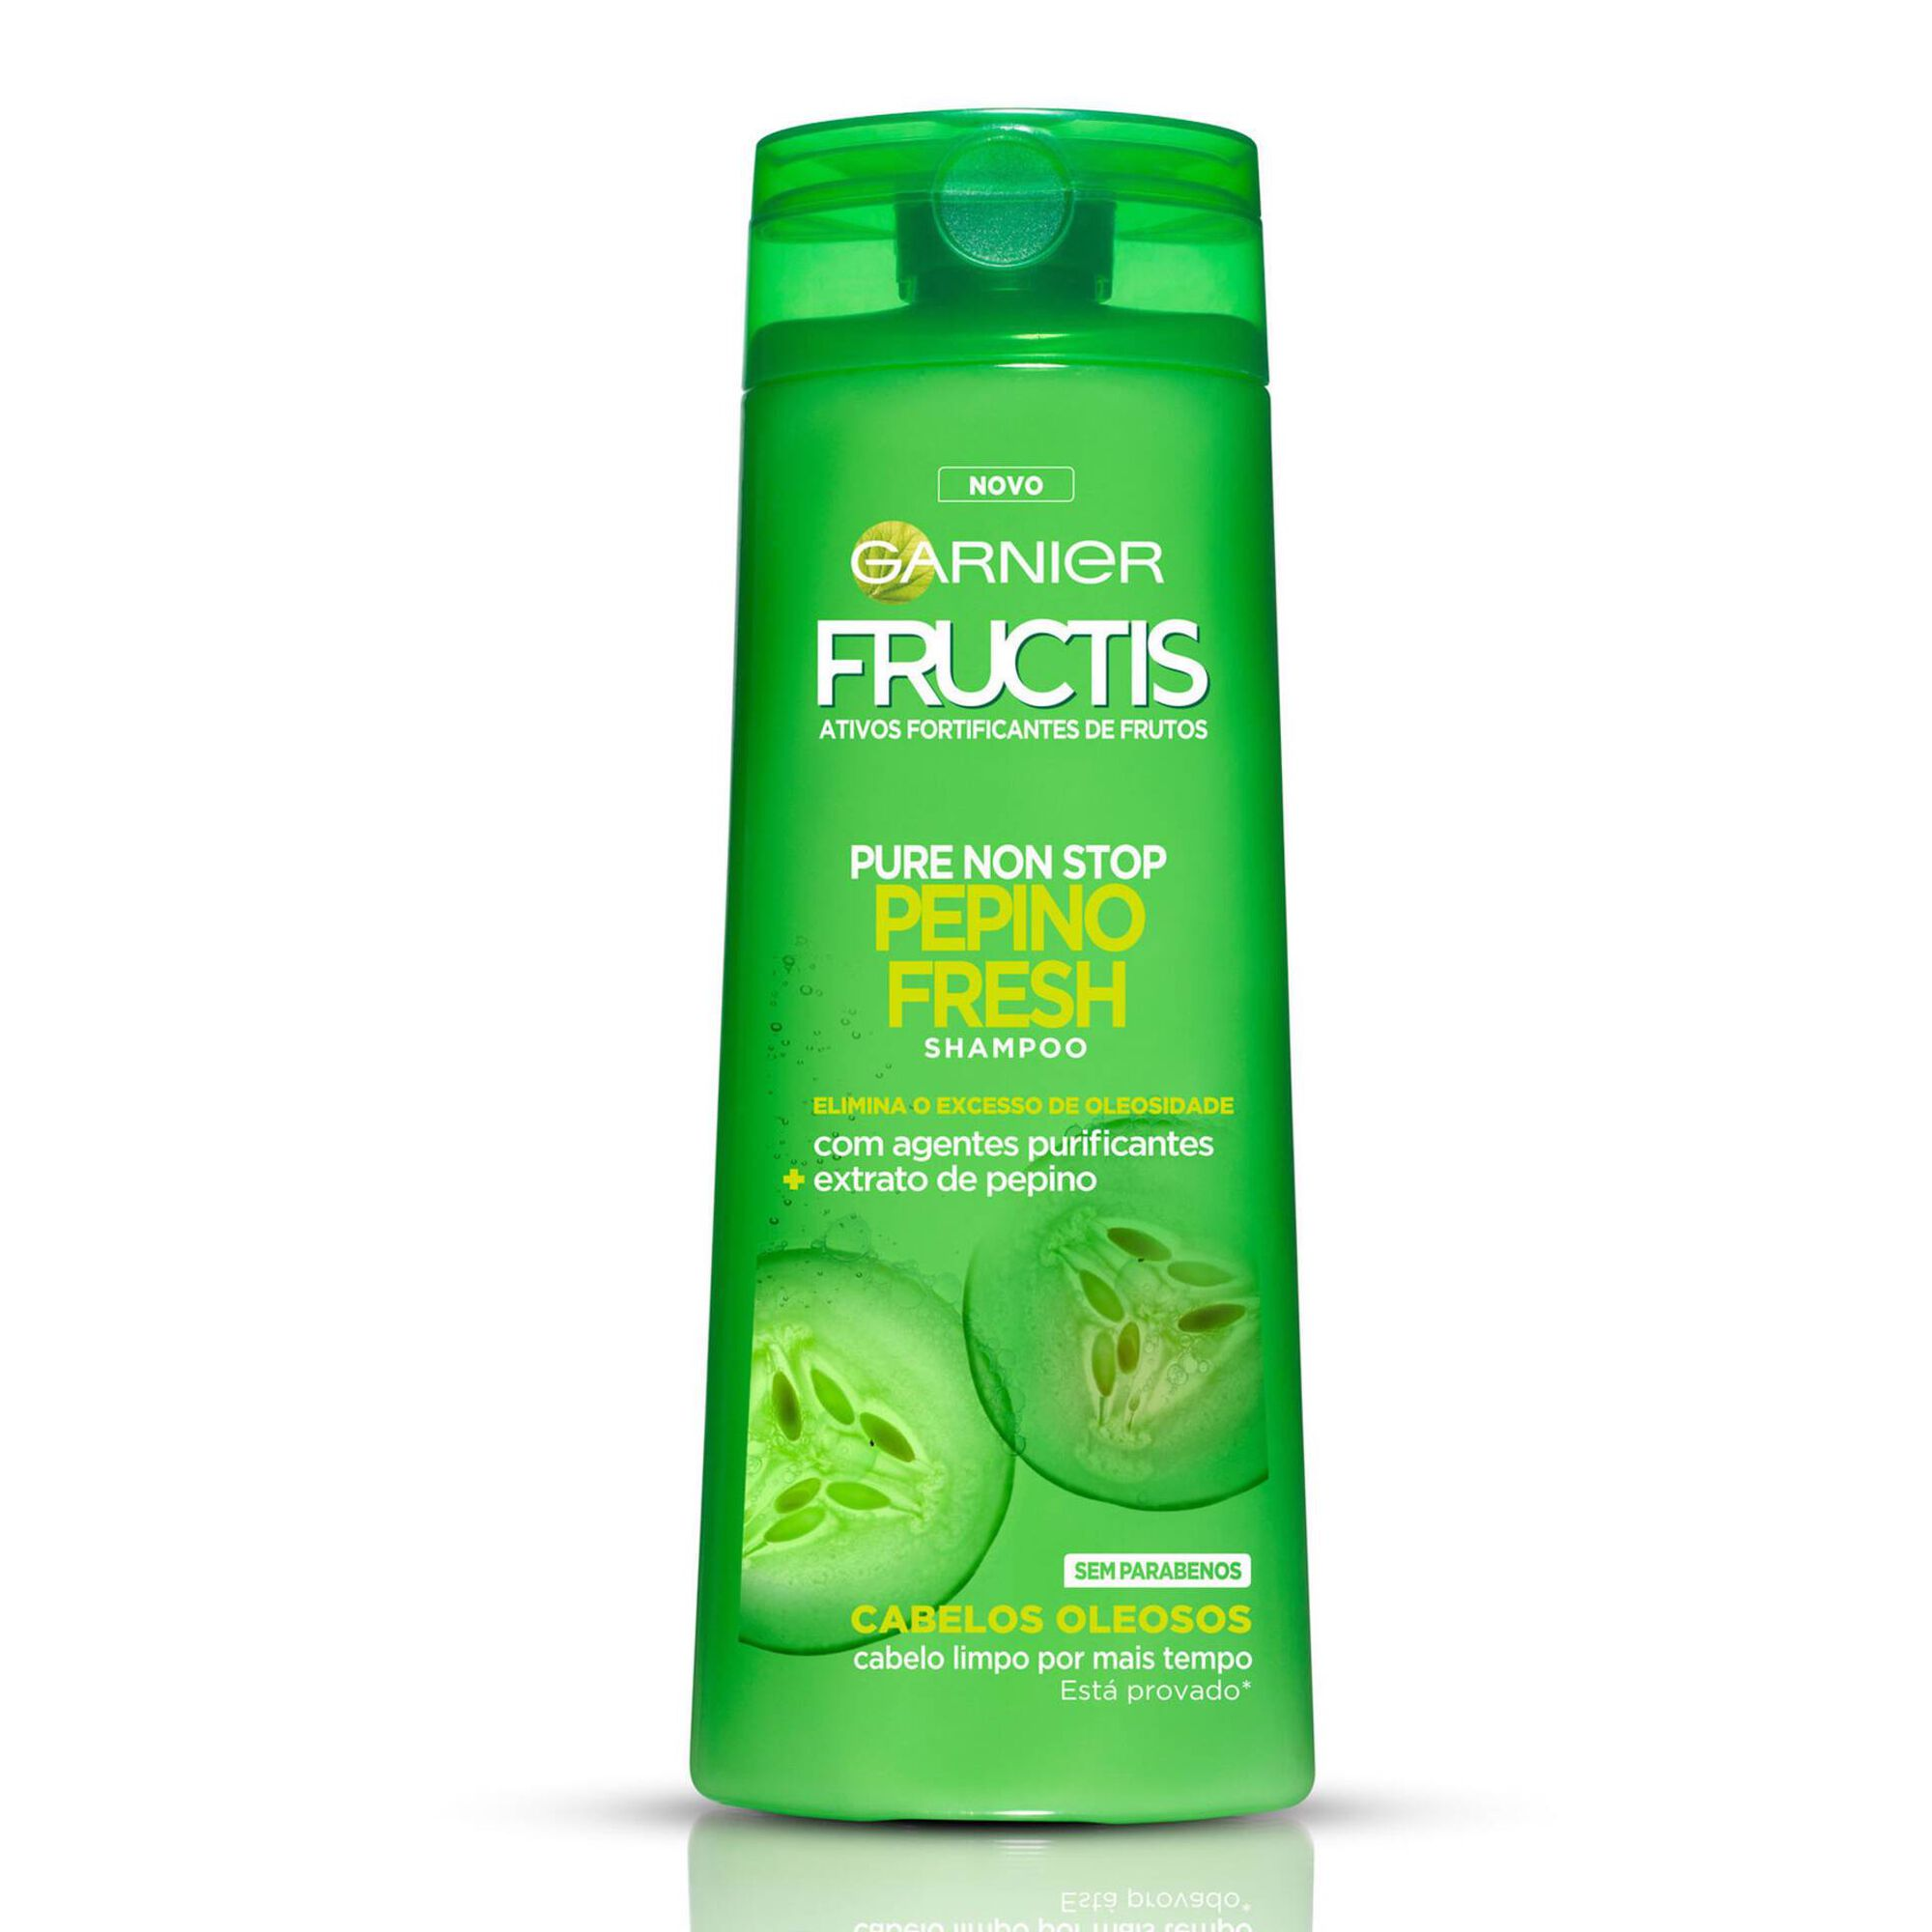 Champô Fructis Pure Non Stop Pepino Fresh